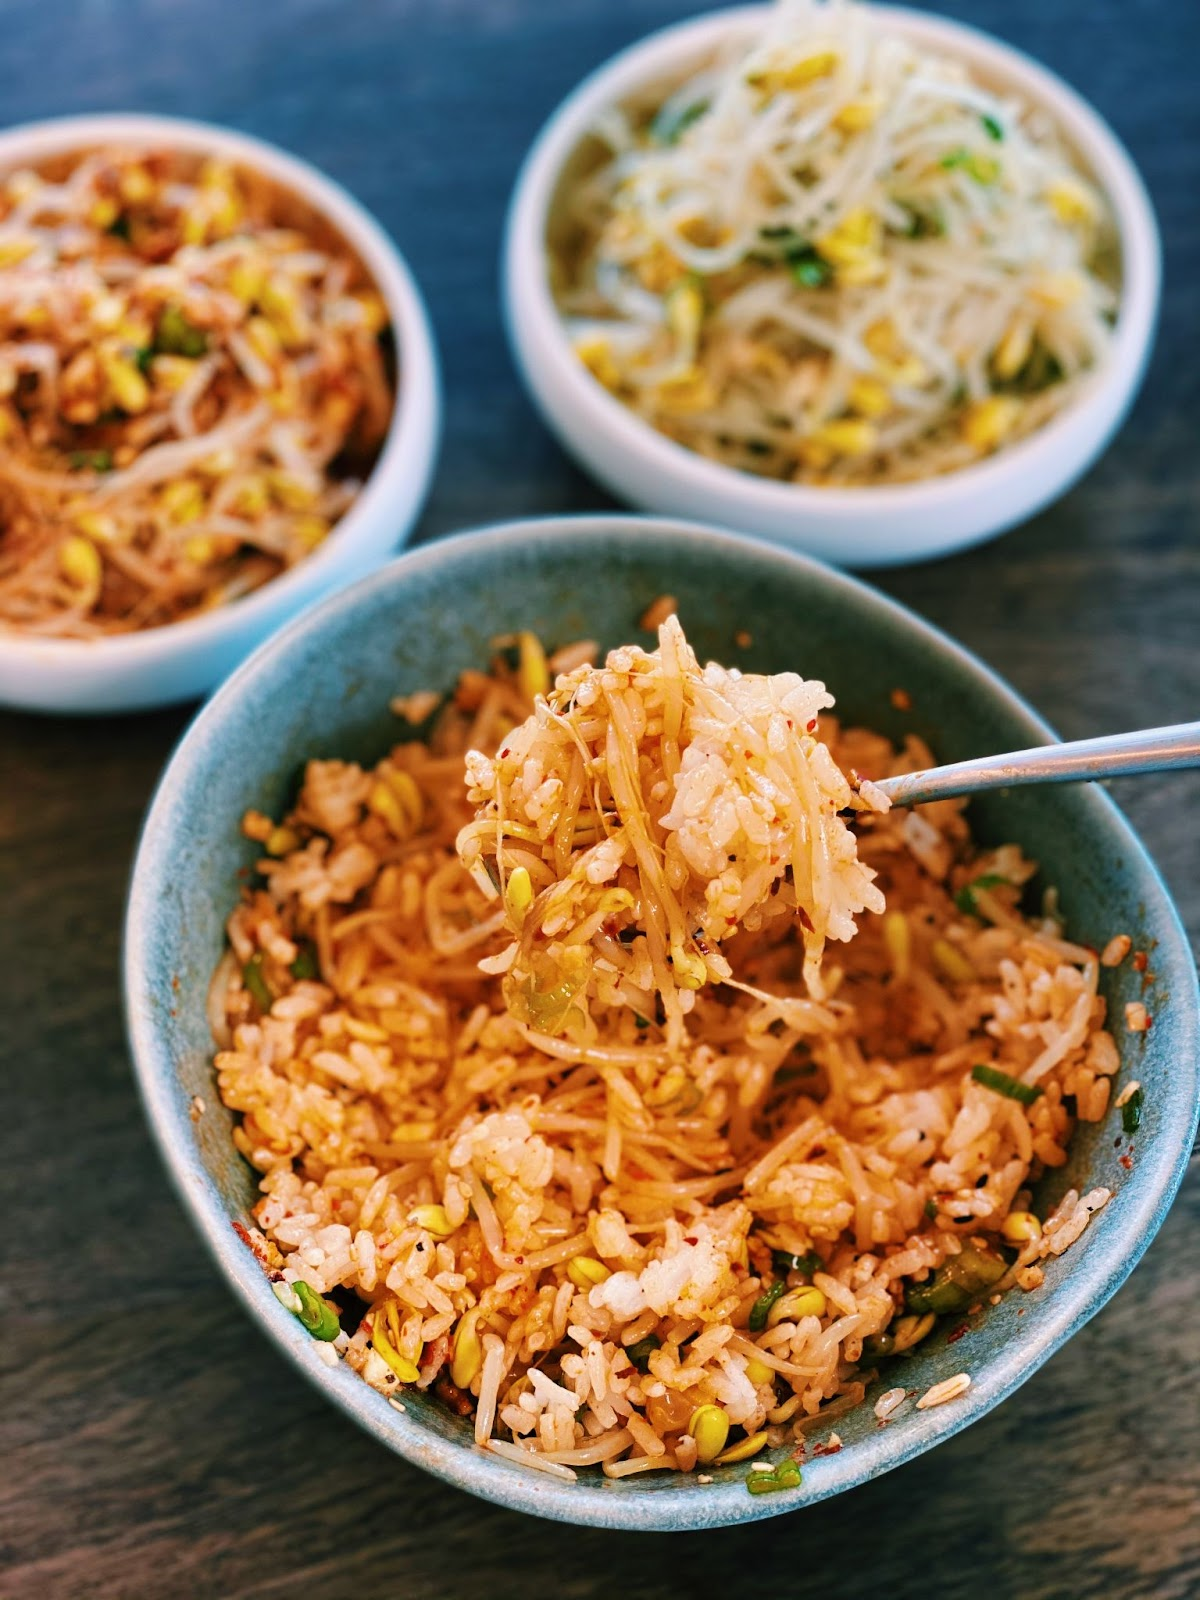 Korean Bean Sprout Side Dish - Kongnamul Muchim